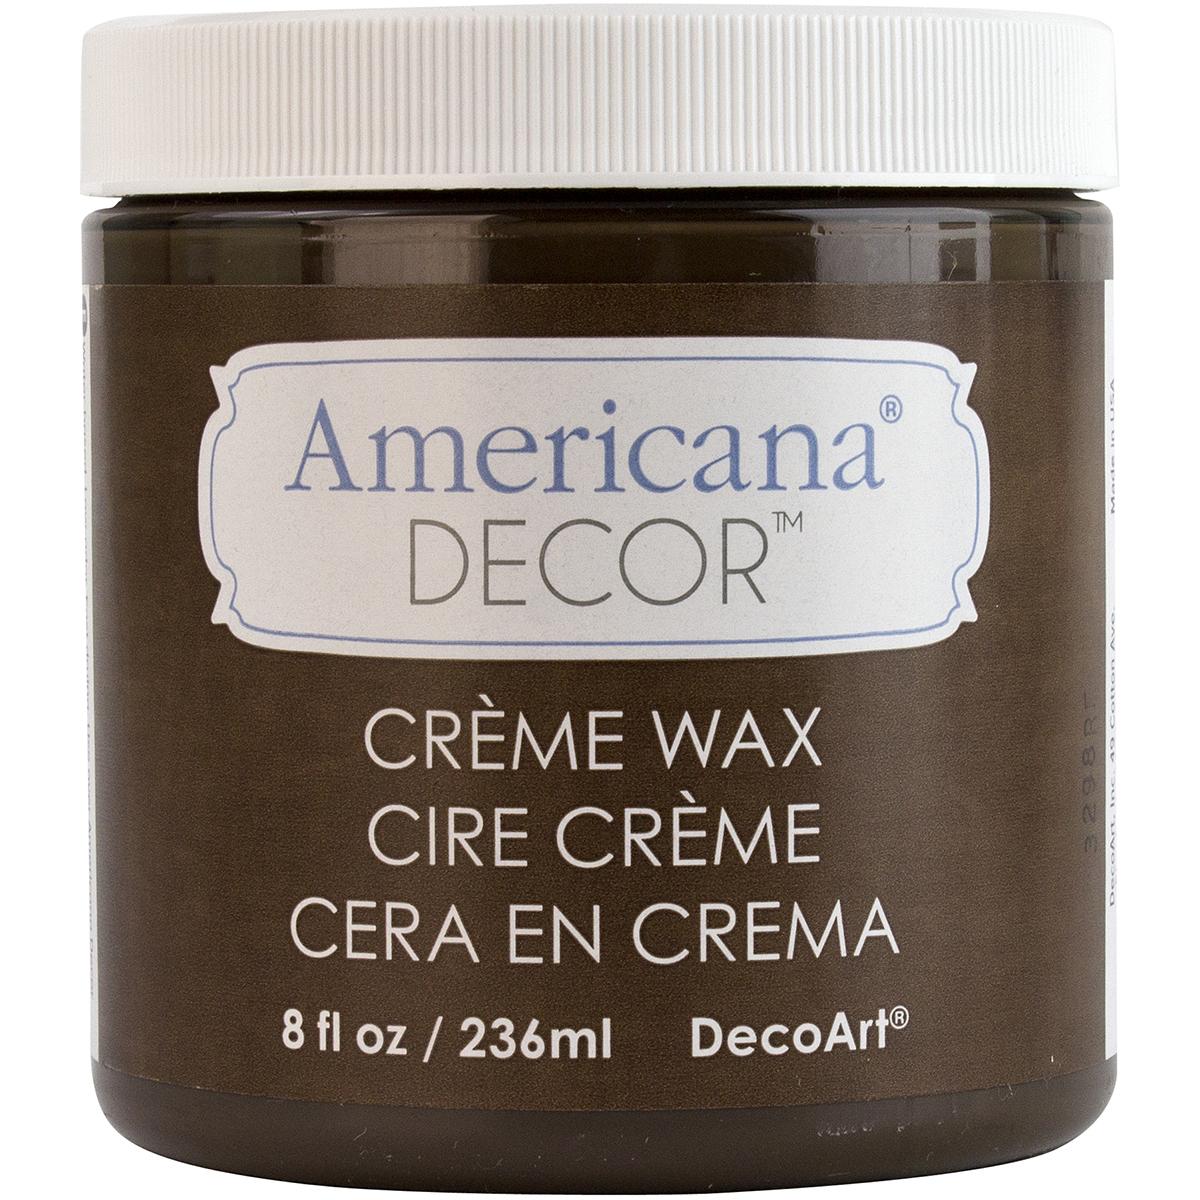 Americana Decor Creme Wax 4oz-Clear